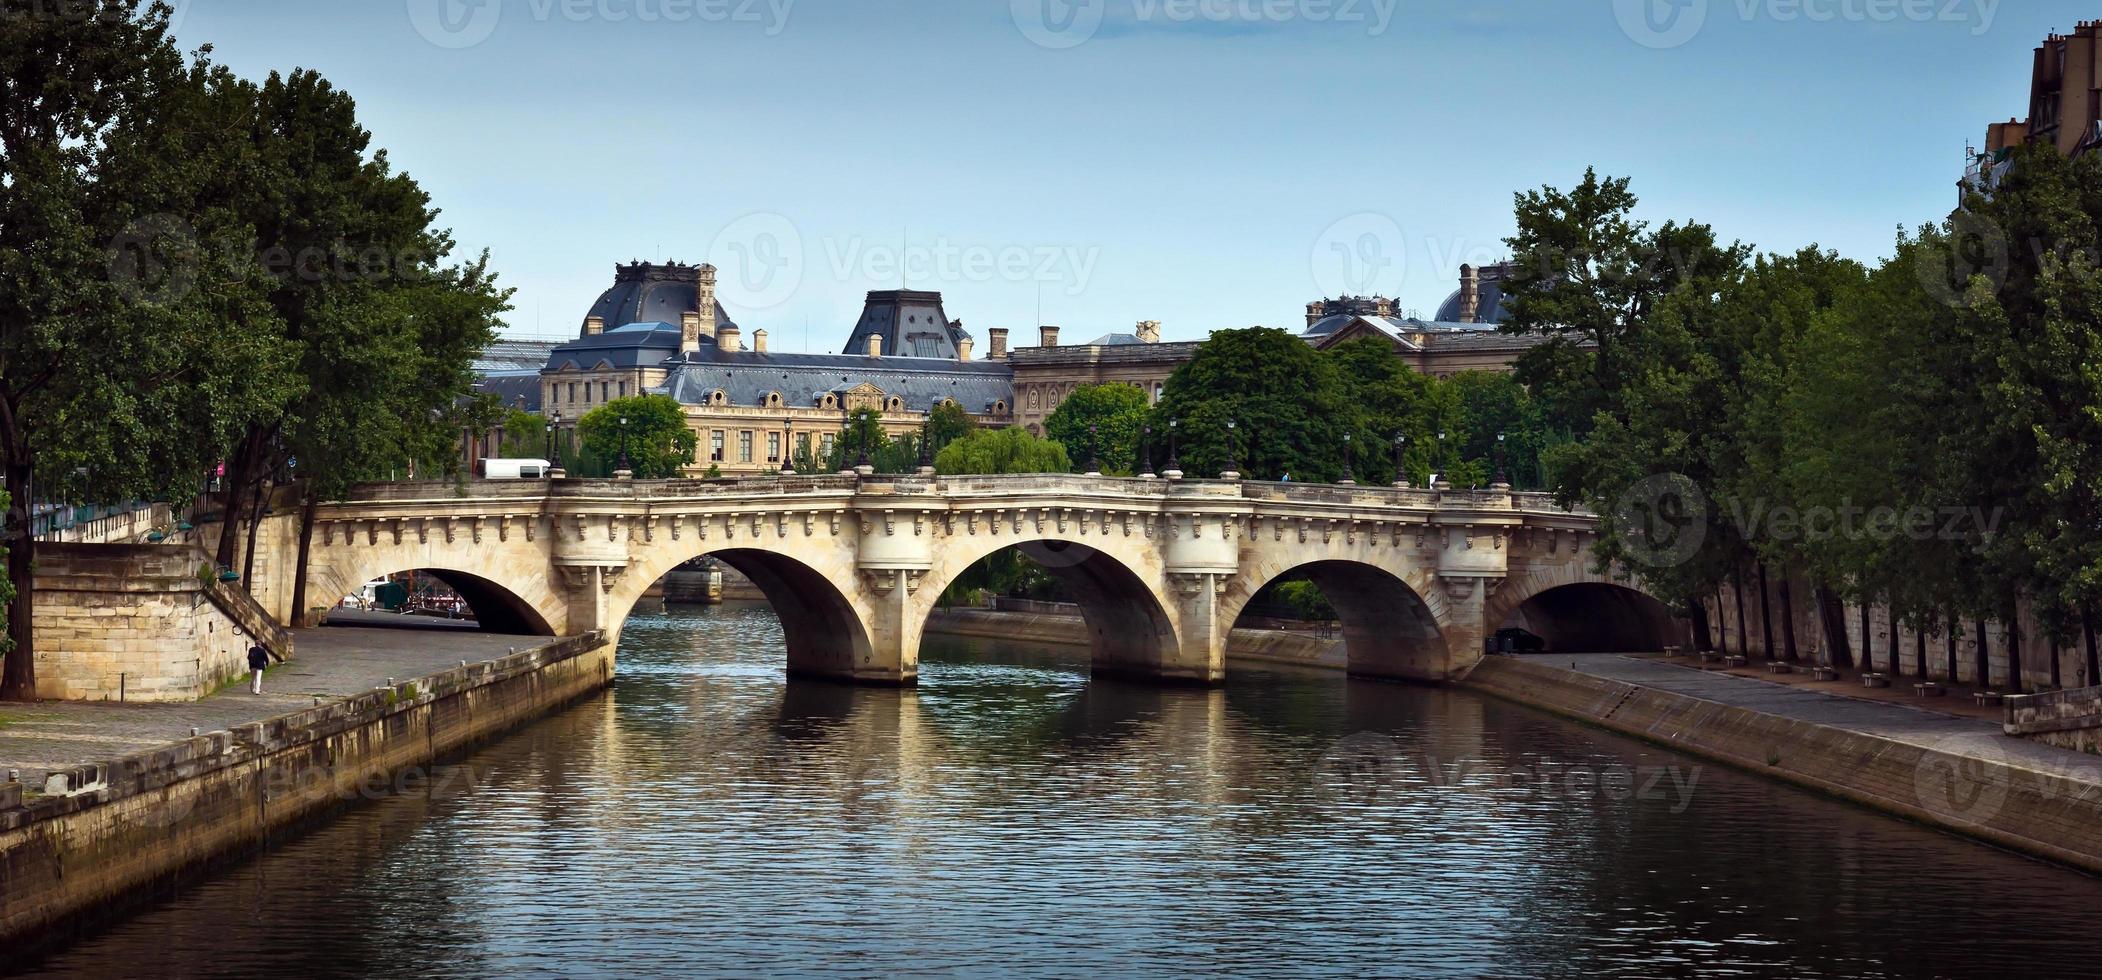 paris - fransk arkitektur foto